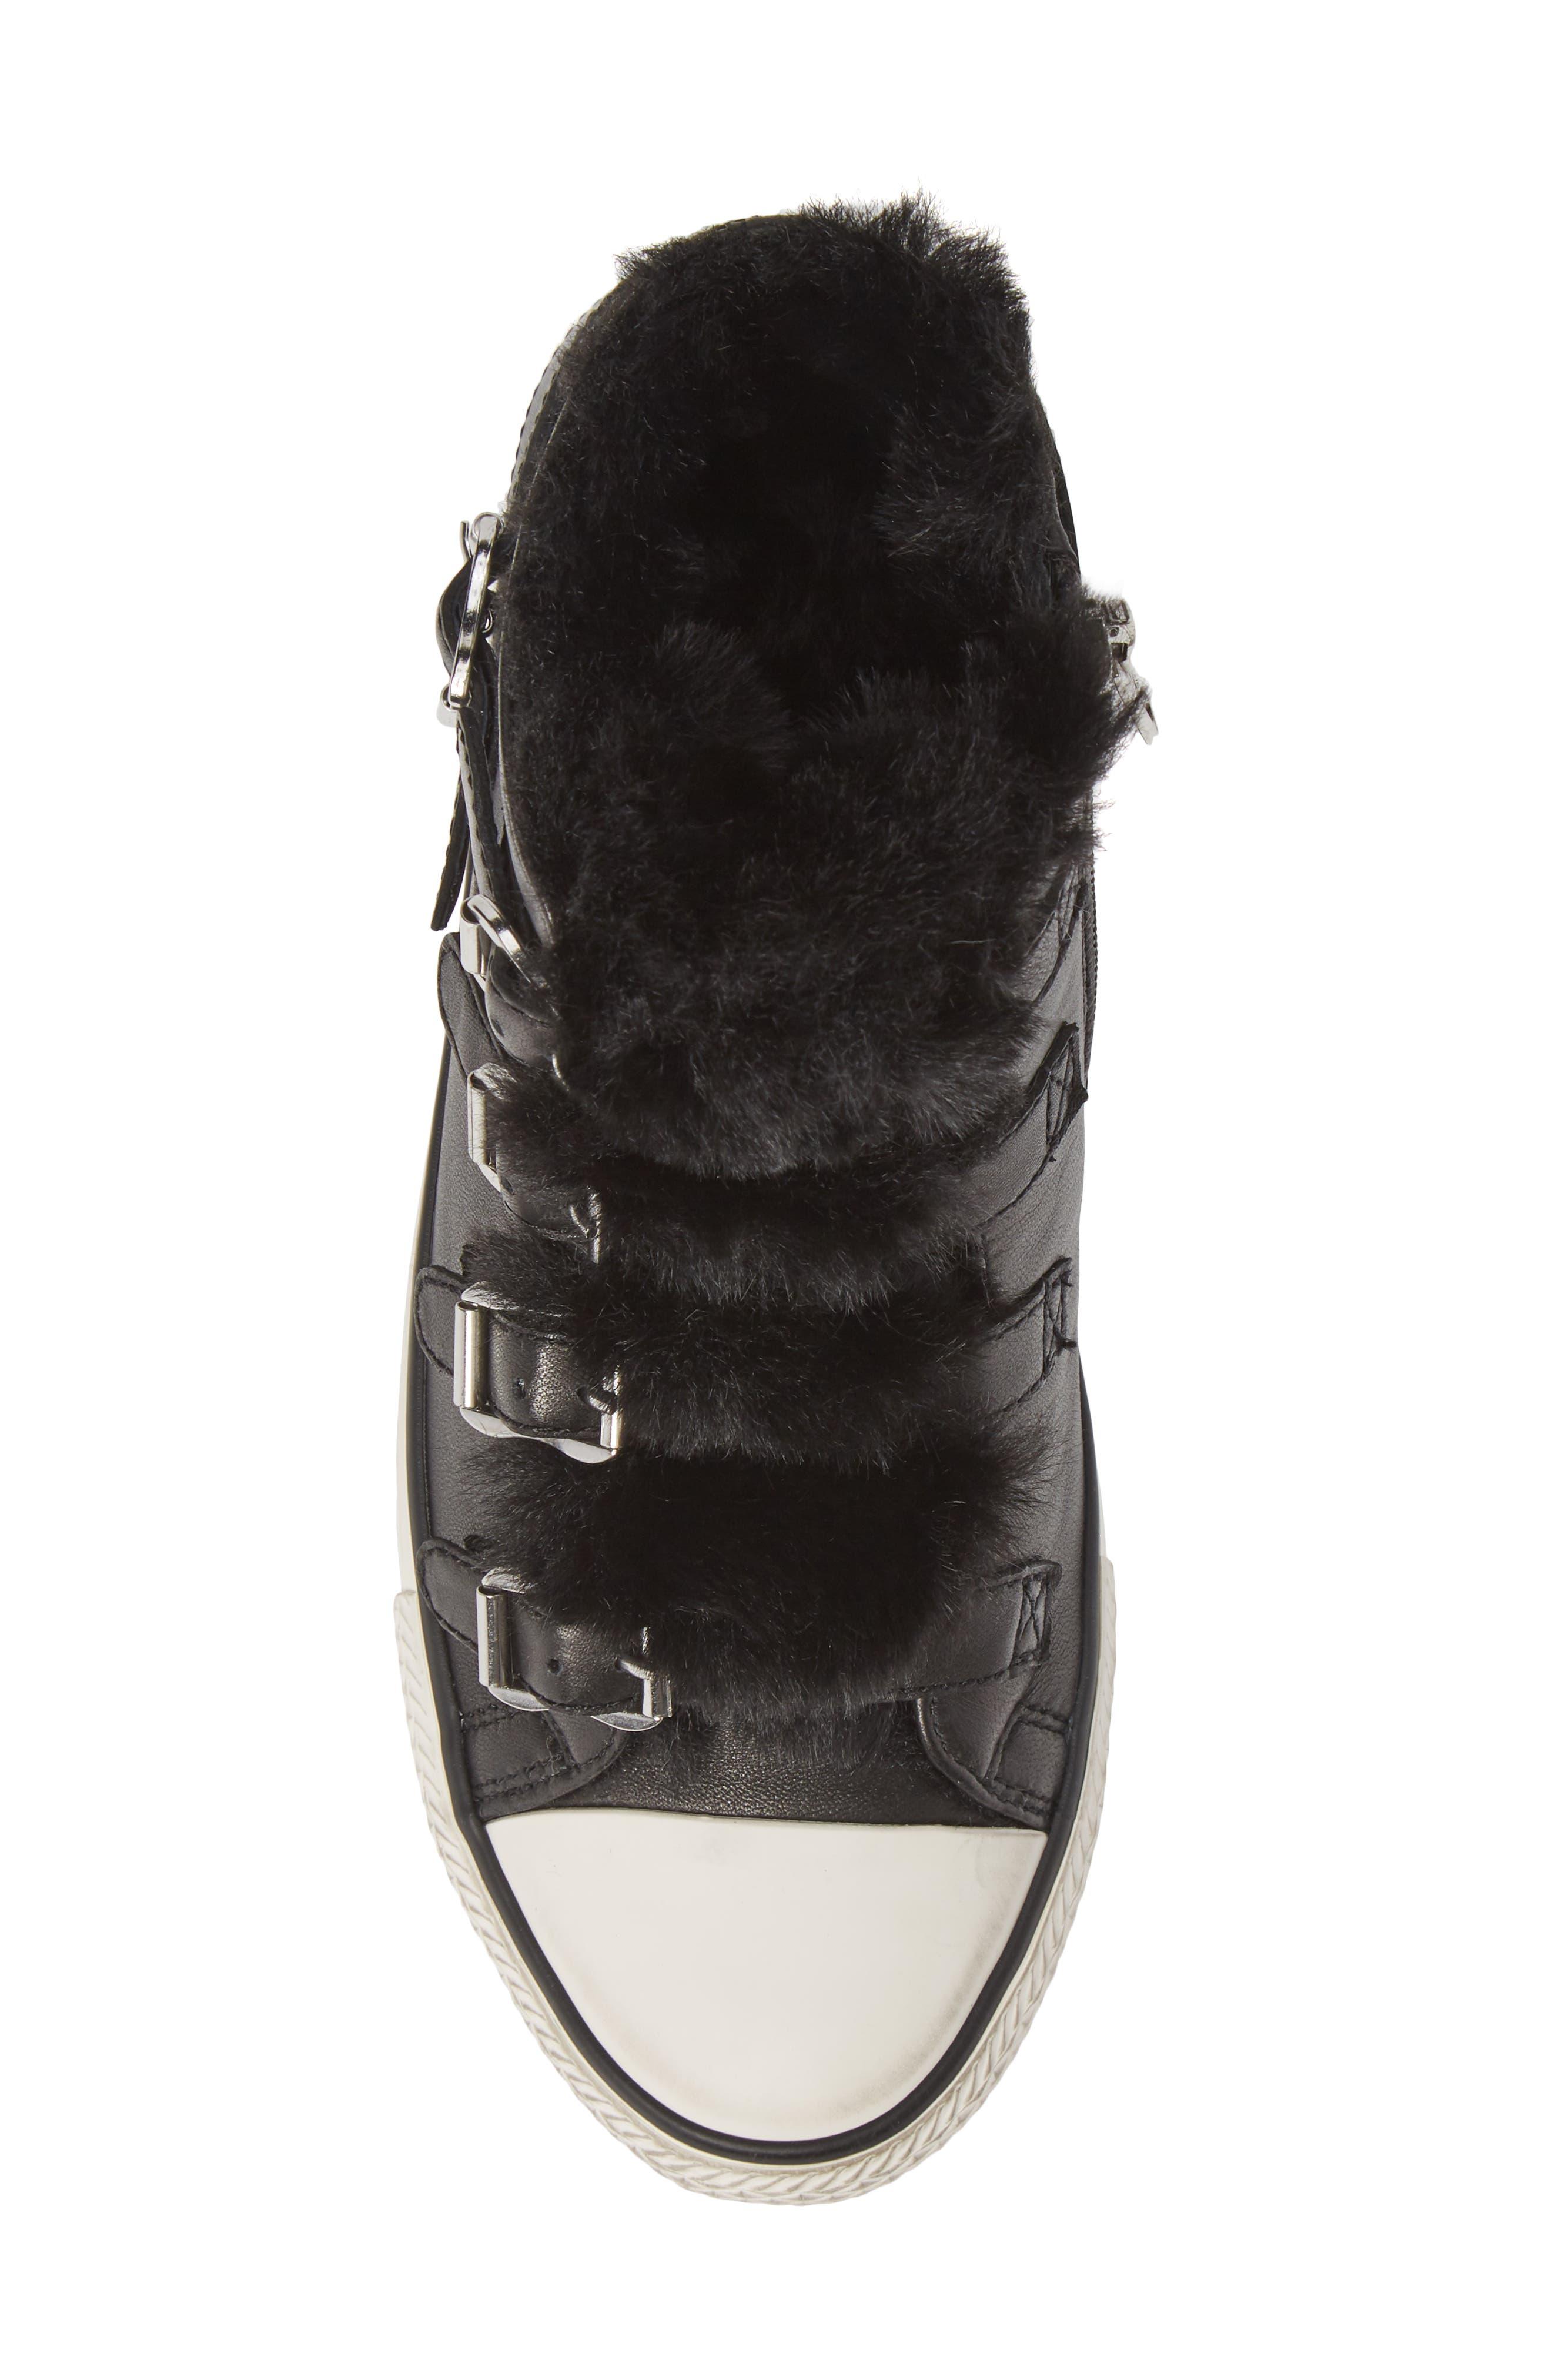 ASH, Valko High Top Sneaker, Alternate thumbnail 5, color, BLACK/ BLACK FAUX FUR